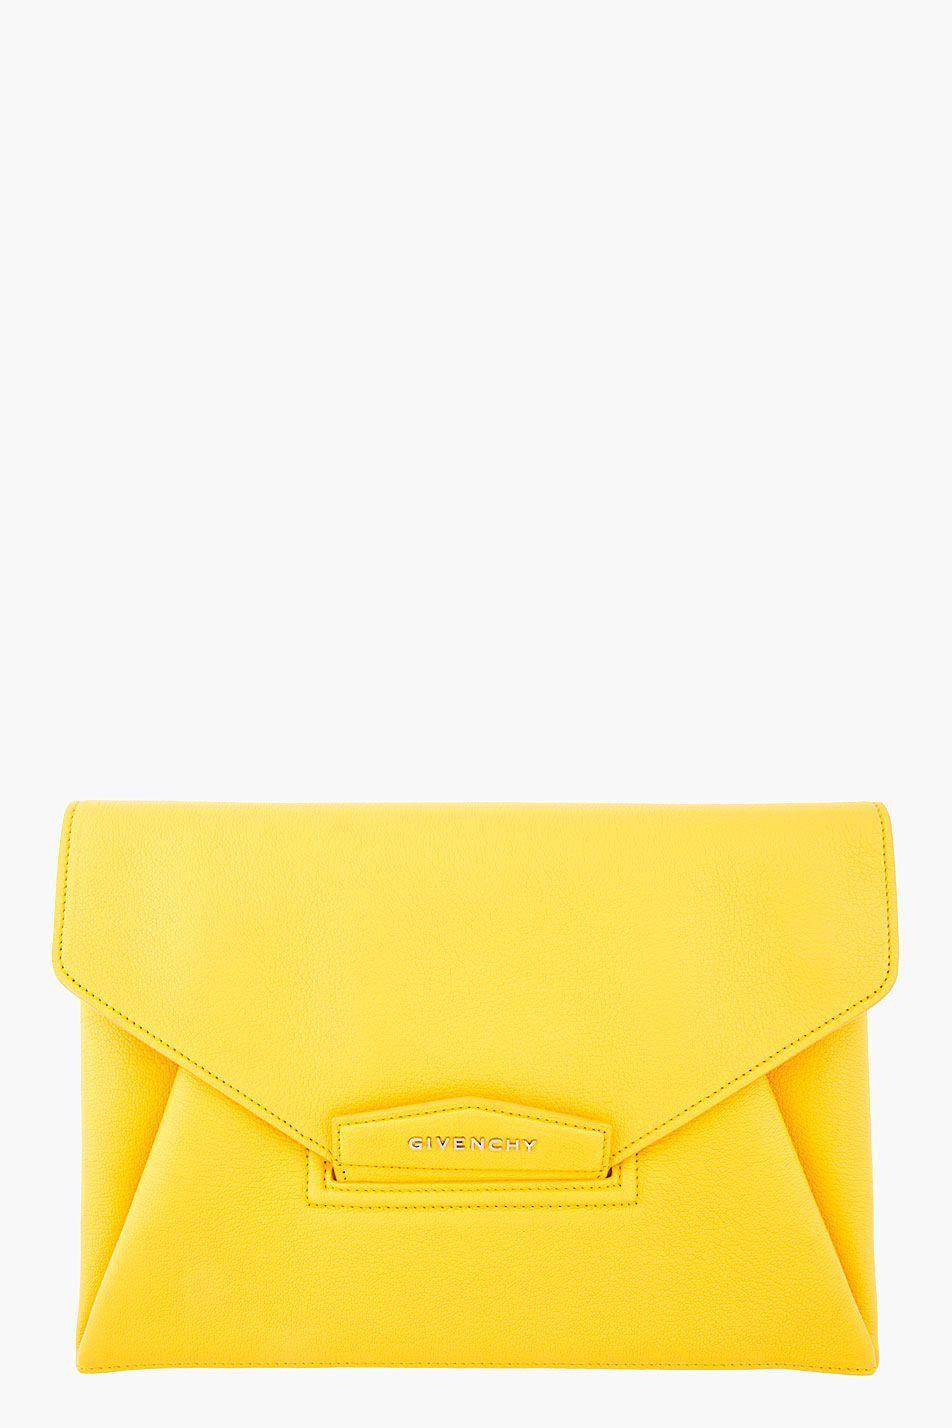 678d5fcacf Yellow Leather Medium Antigona Envelope Clutch from Givenchy ...